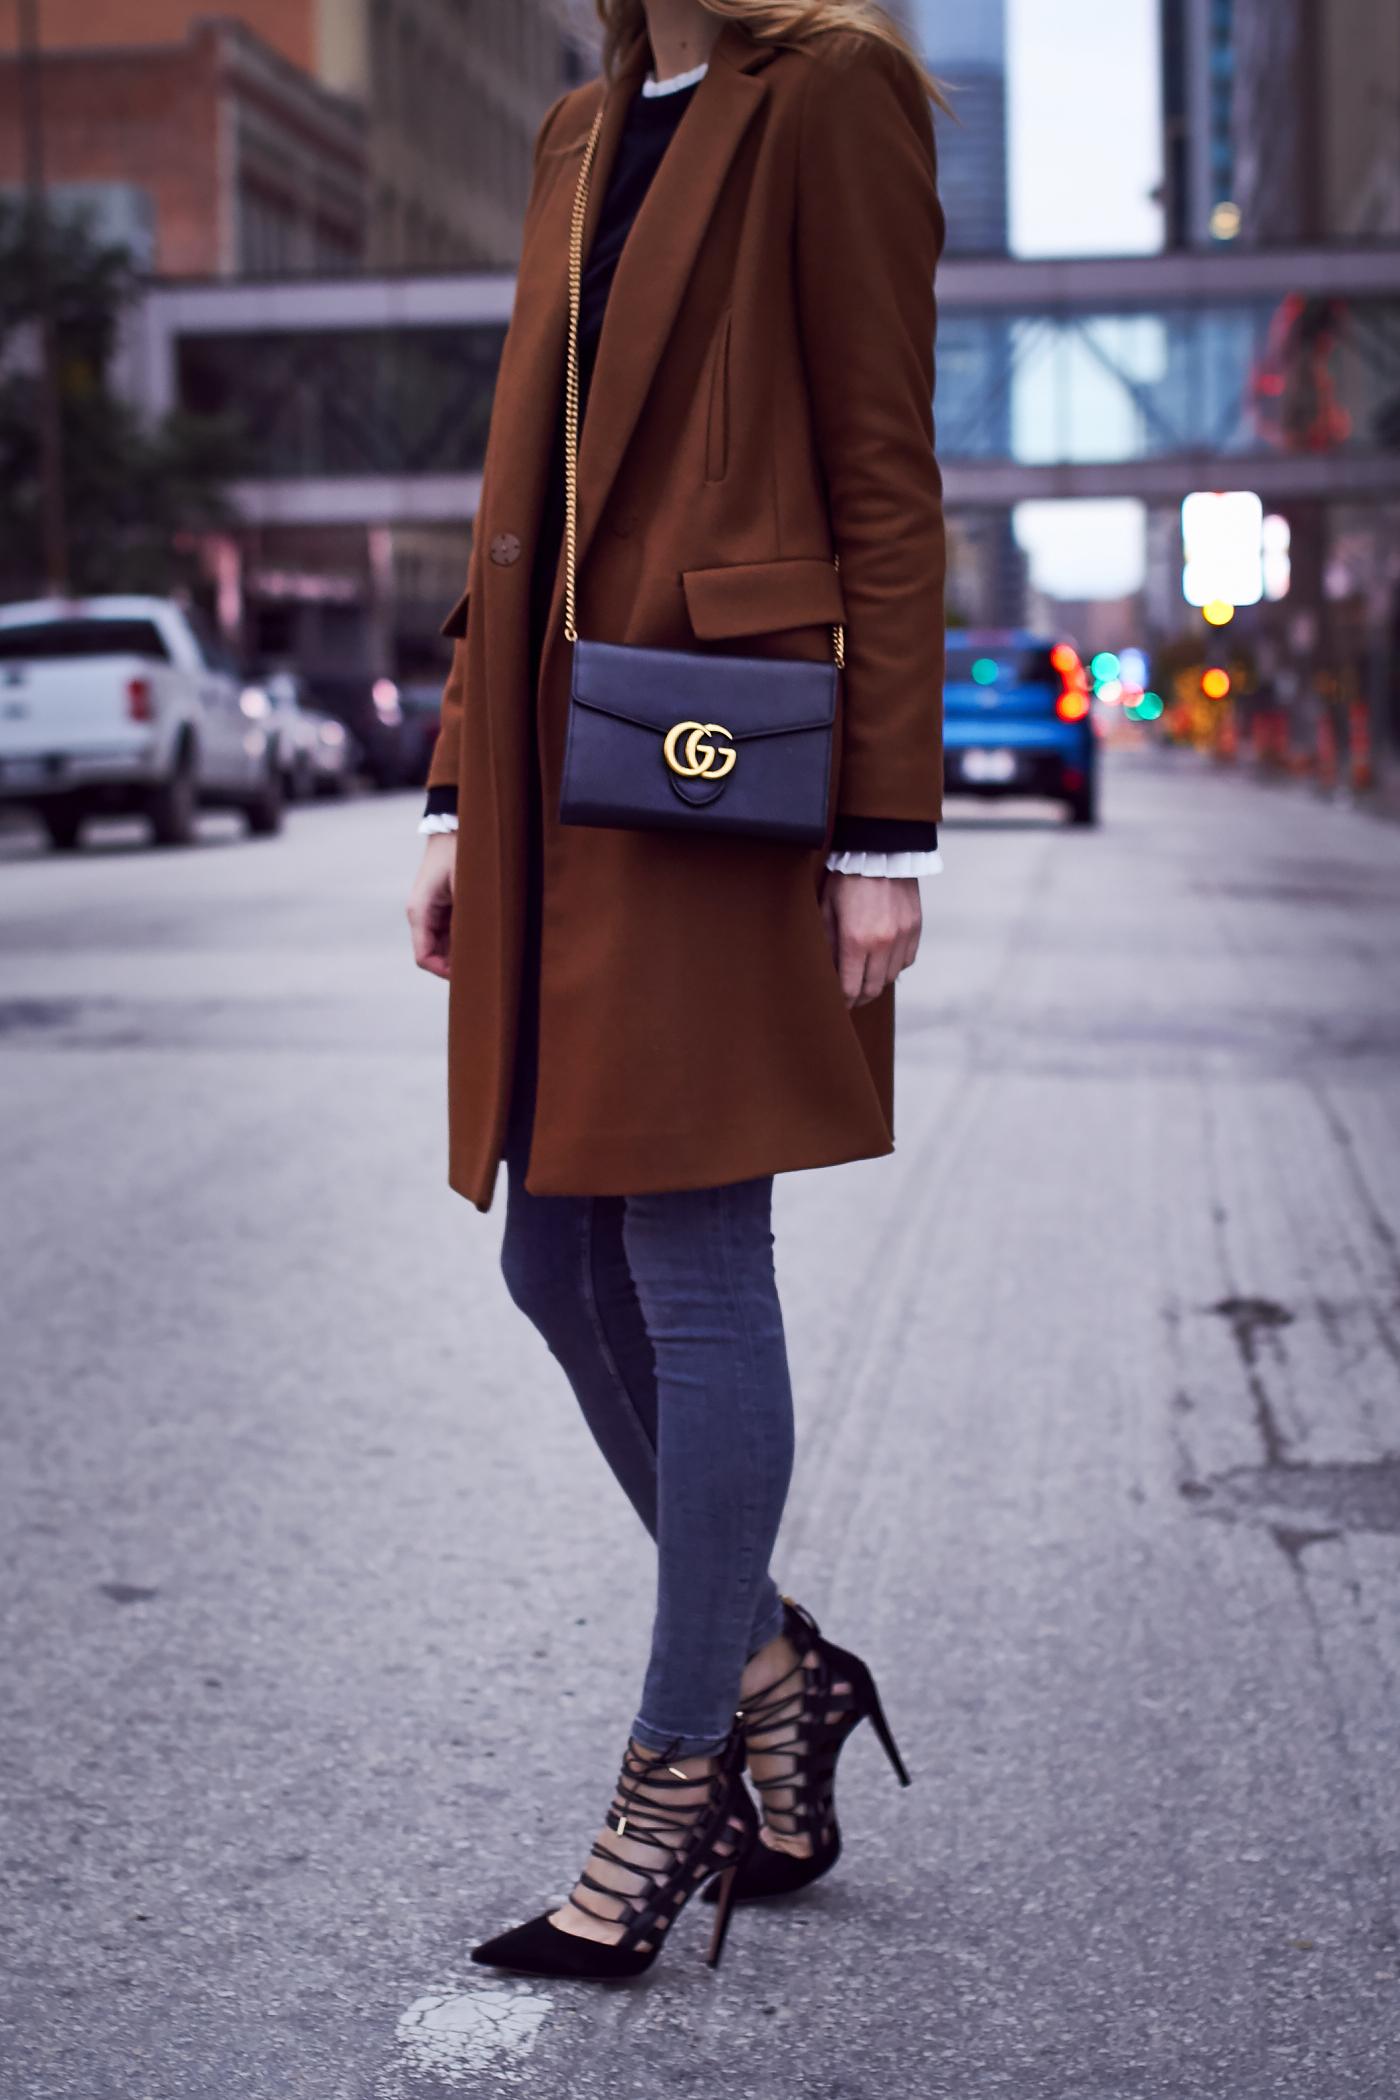 Fall Outfit, Camel Coat, Grey Skinny Jeans, Aquazzura Amazon Pumps, Gucci Marmont Handbag, Black Bell Sleeve Sweater